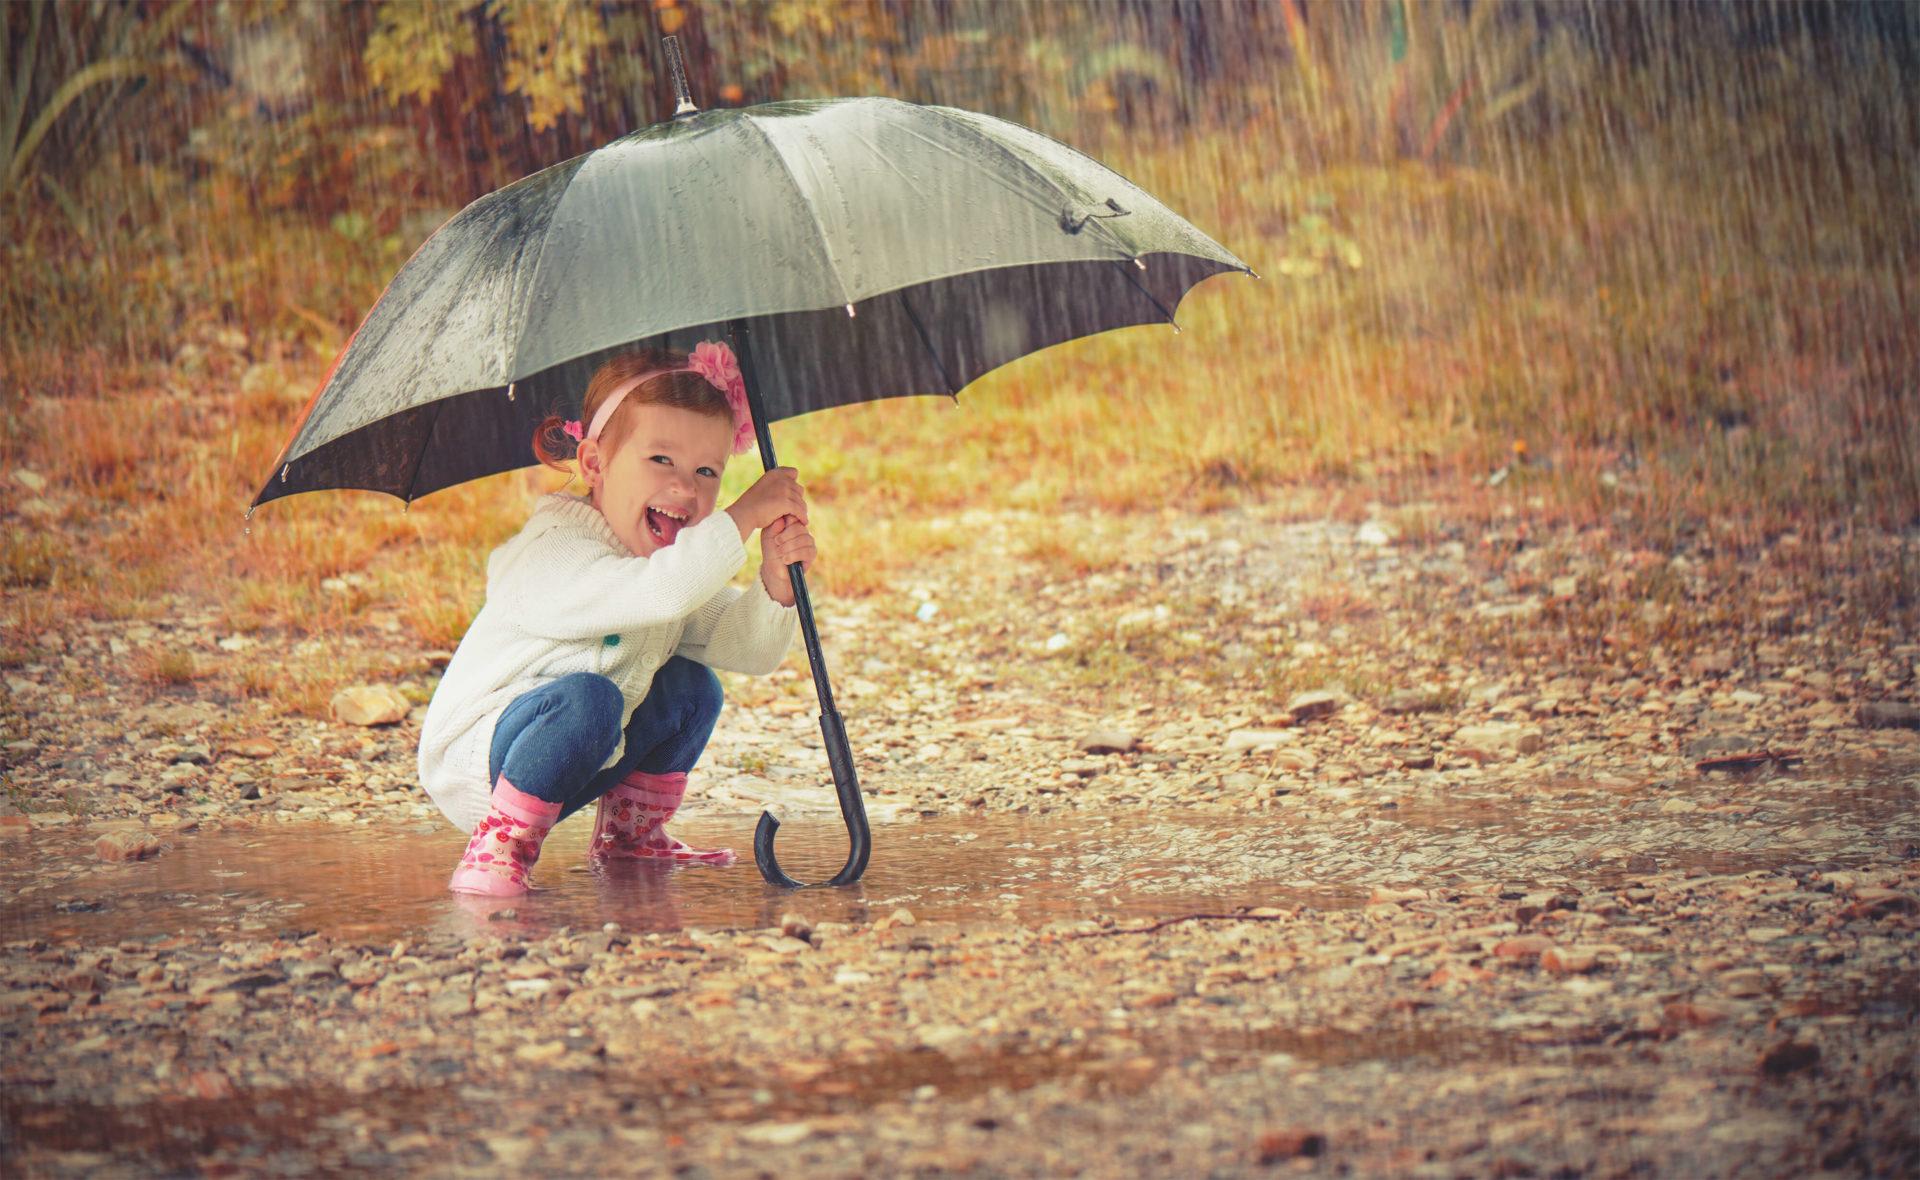 Little girl holding umbrella in the rain